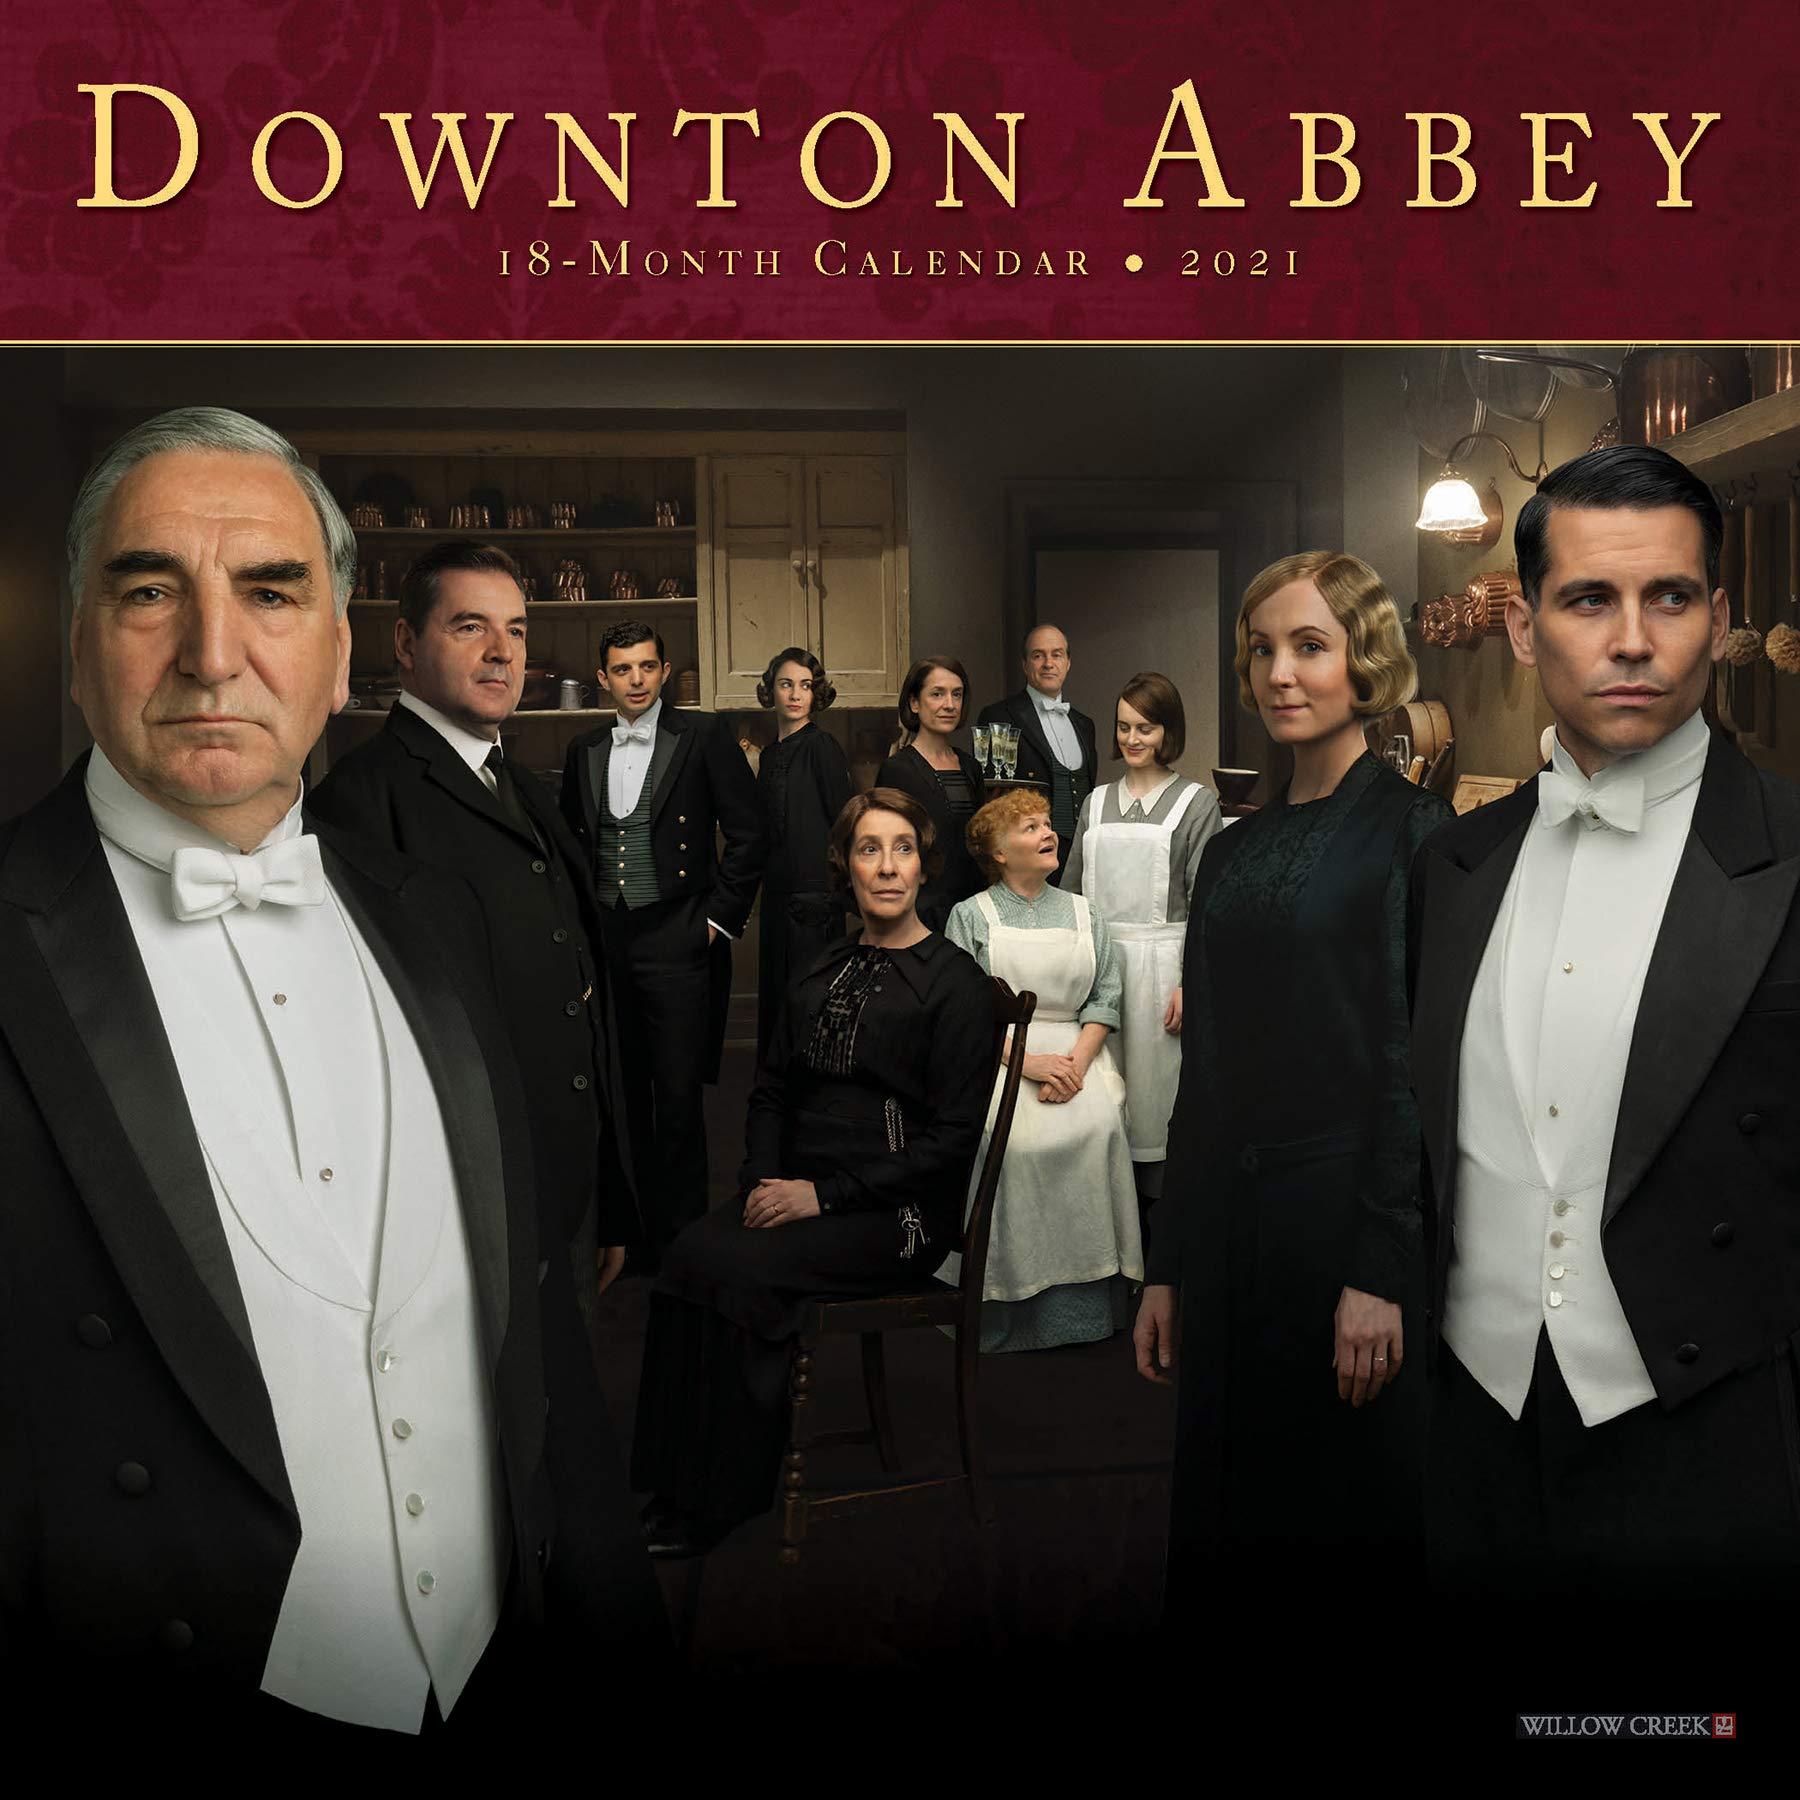 Downton Abbey 2021 Mini Wall Calendar: Fellowes, Julian